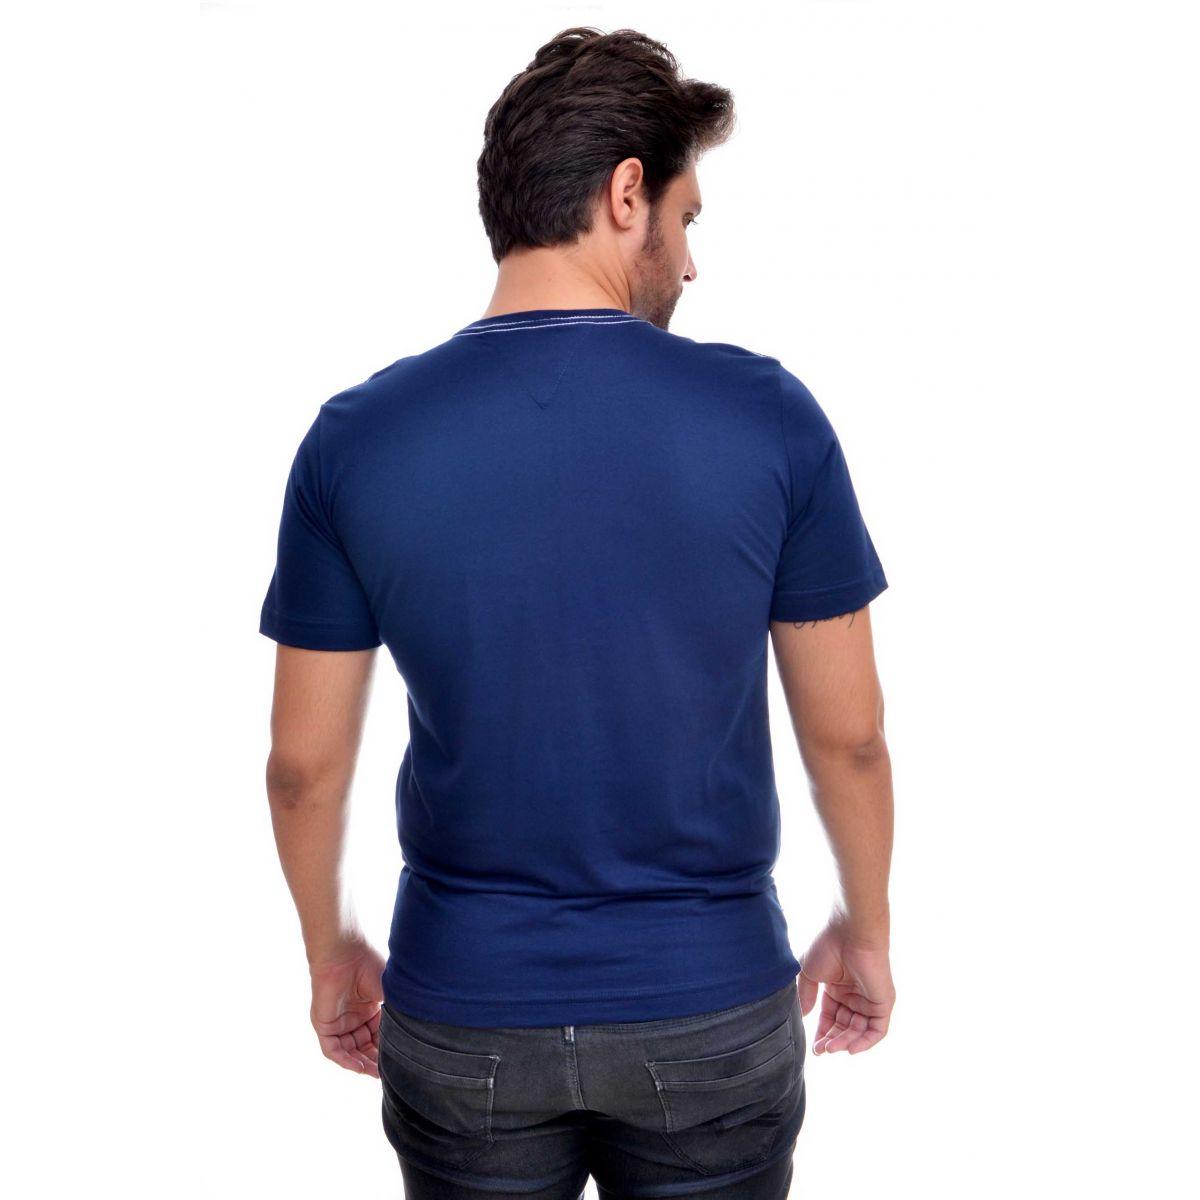 Camiseta TH NY Azul Marinho  - Ca Brasileira